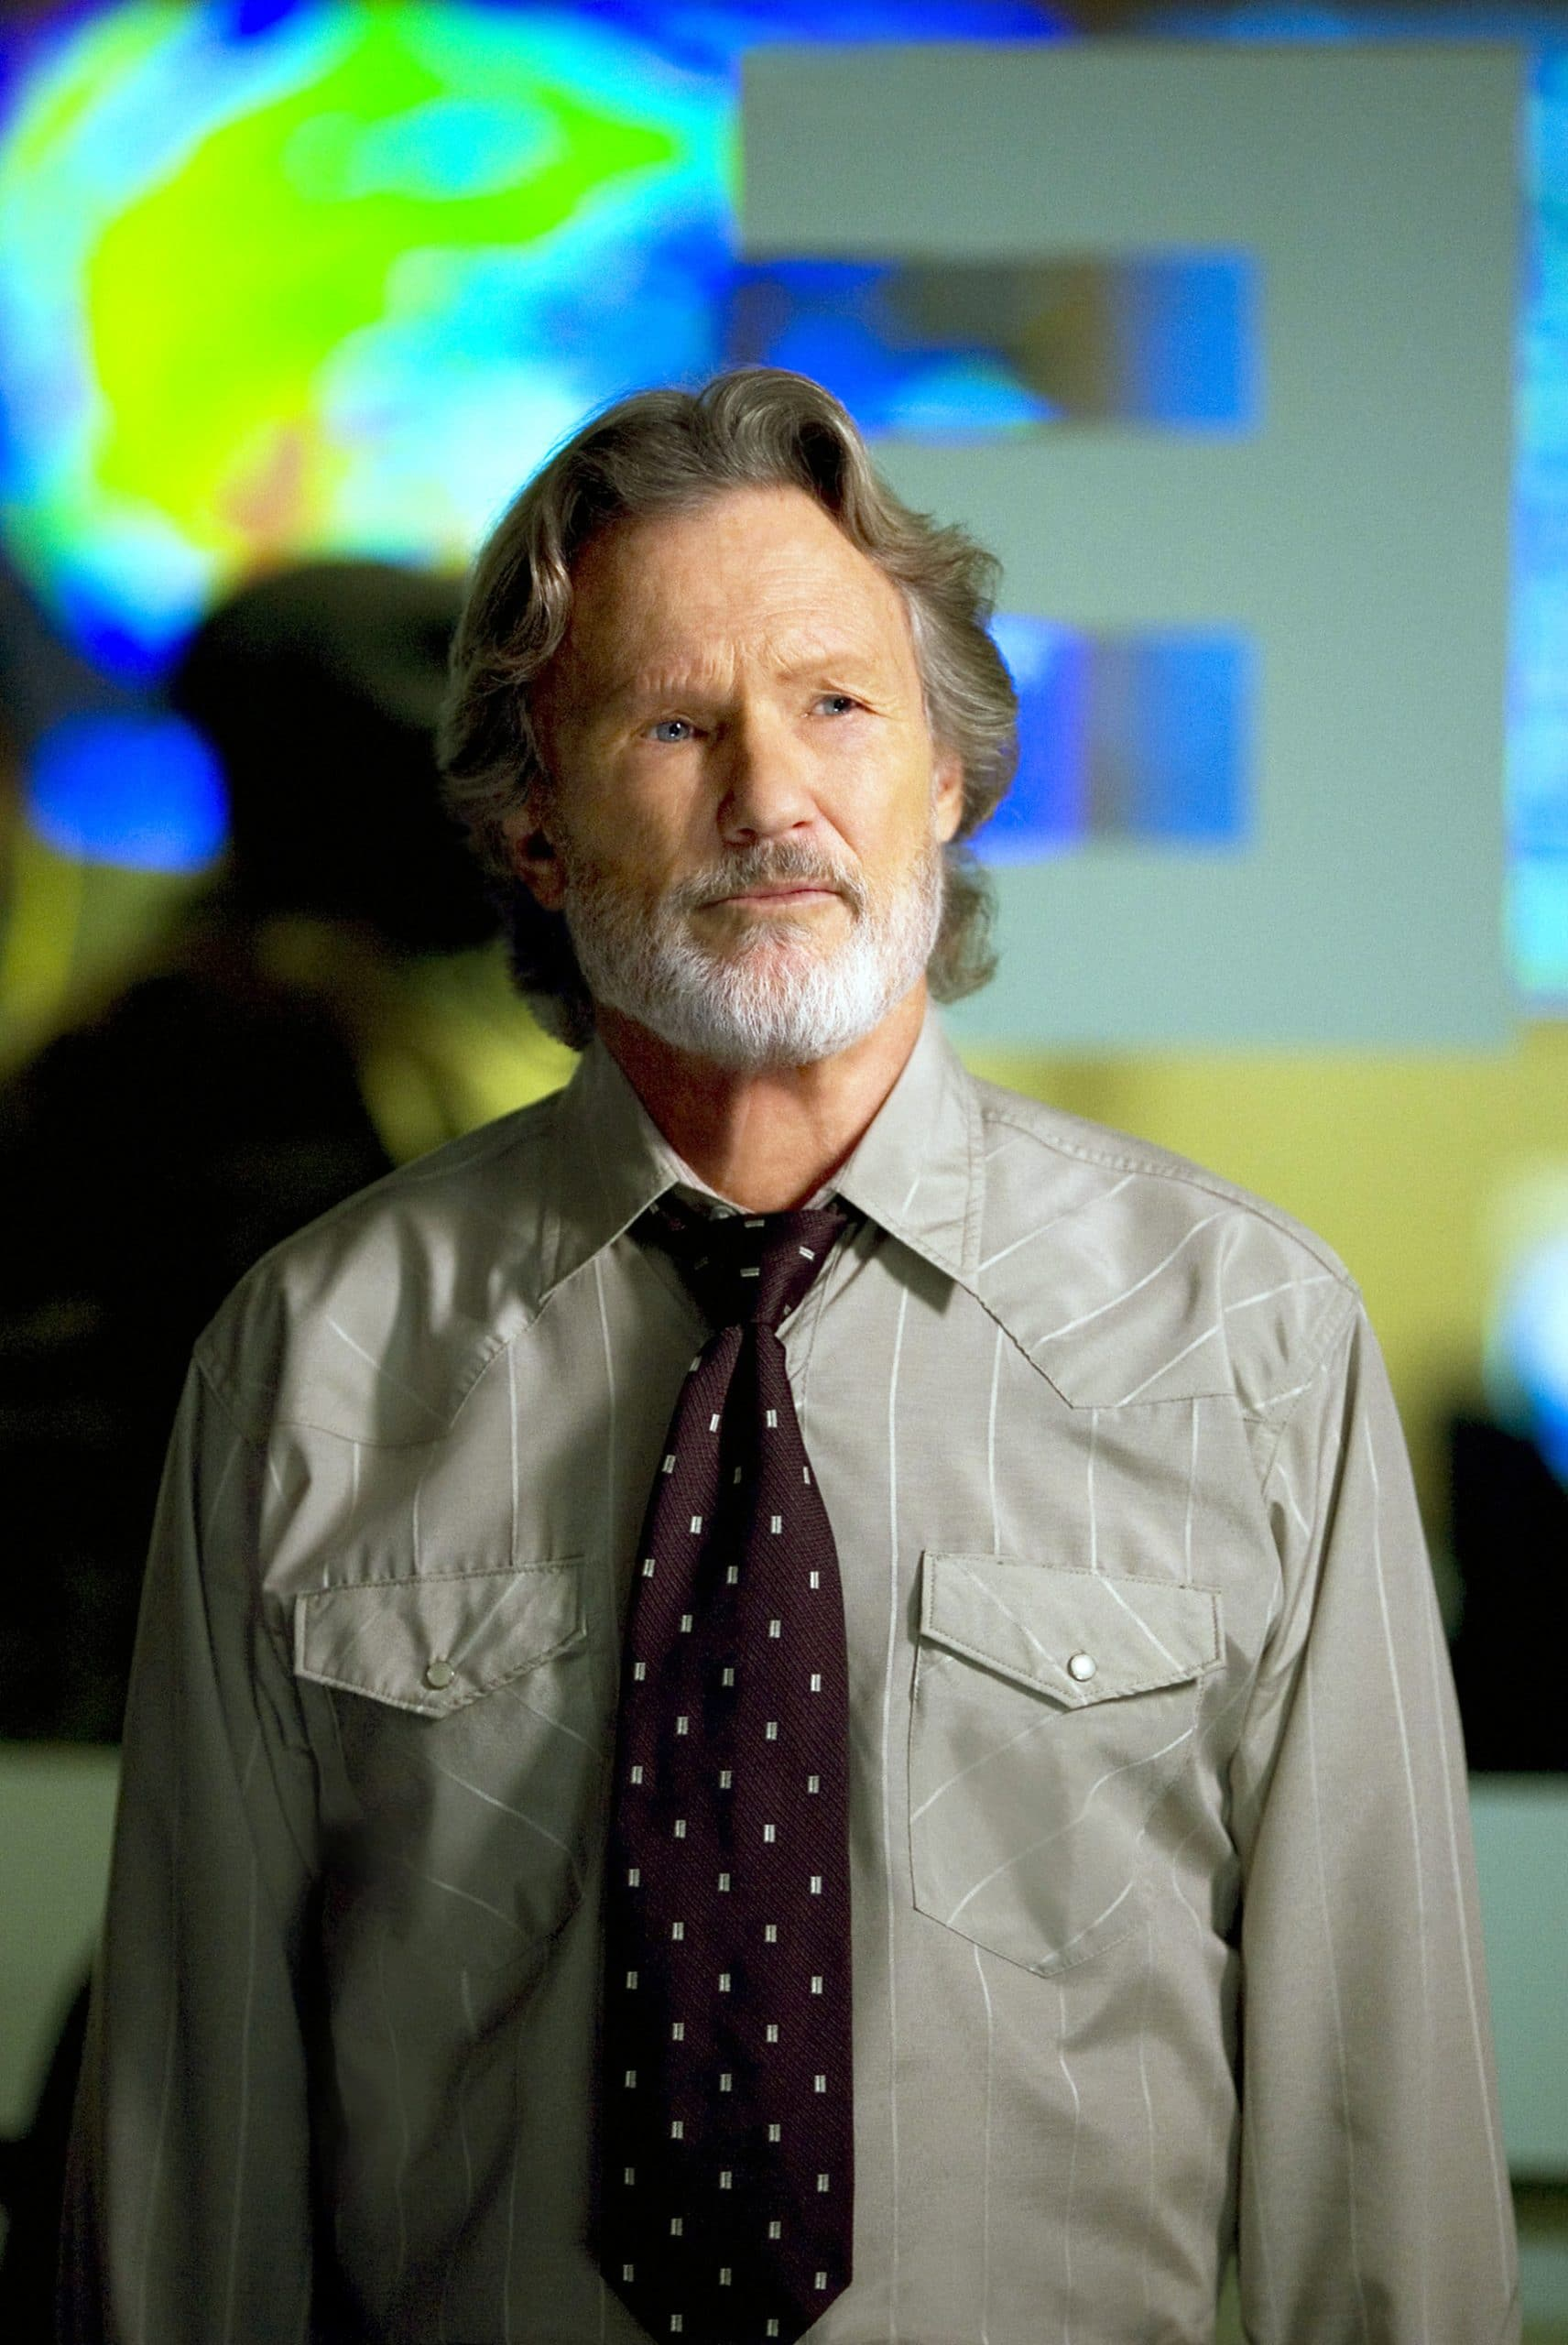 14 HOURS, Kris Kristofferson, 2005